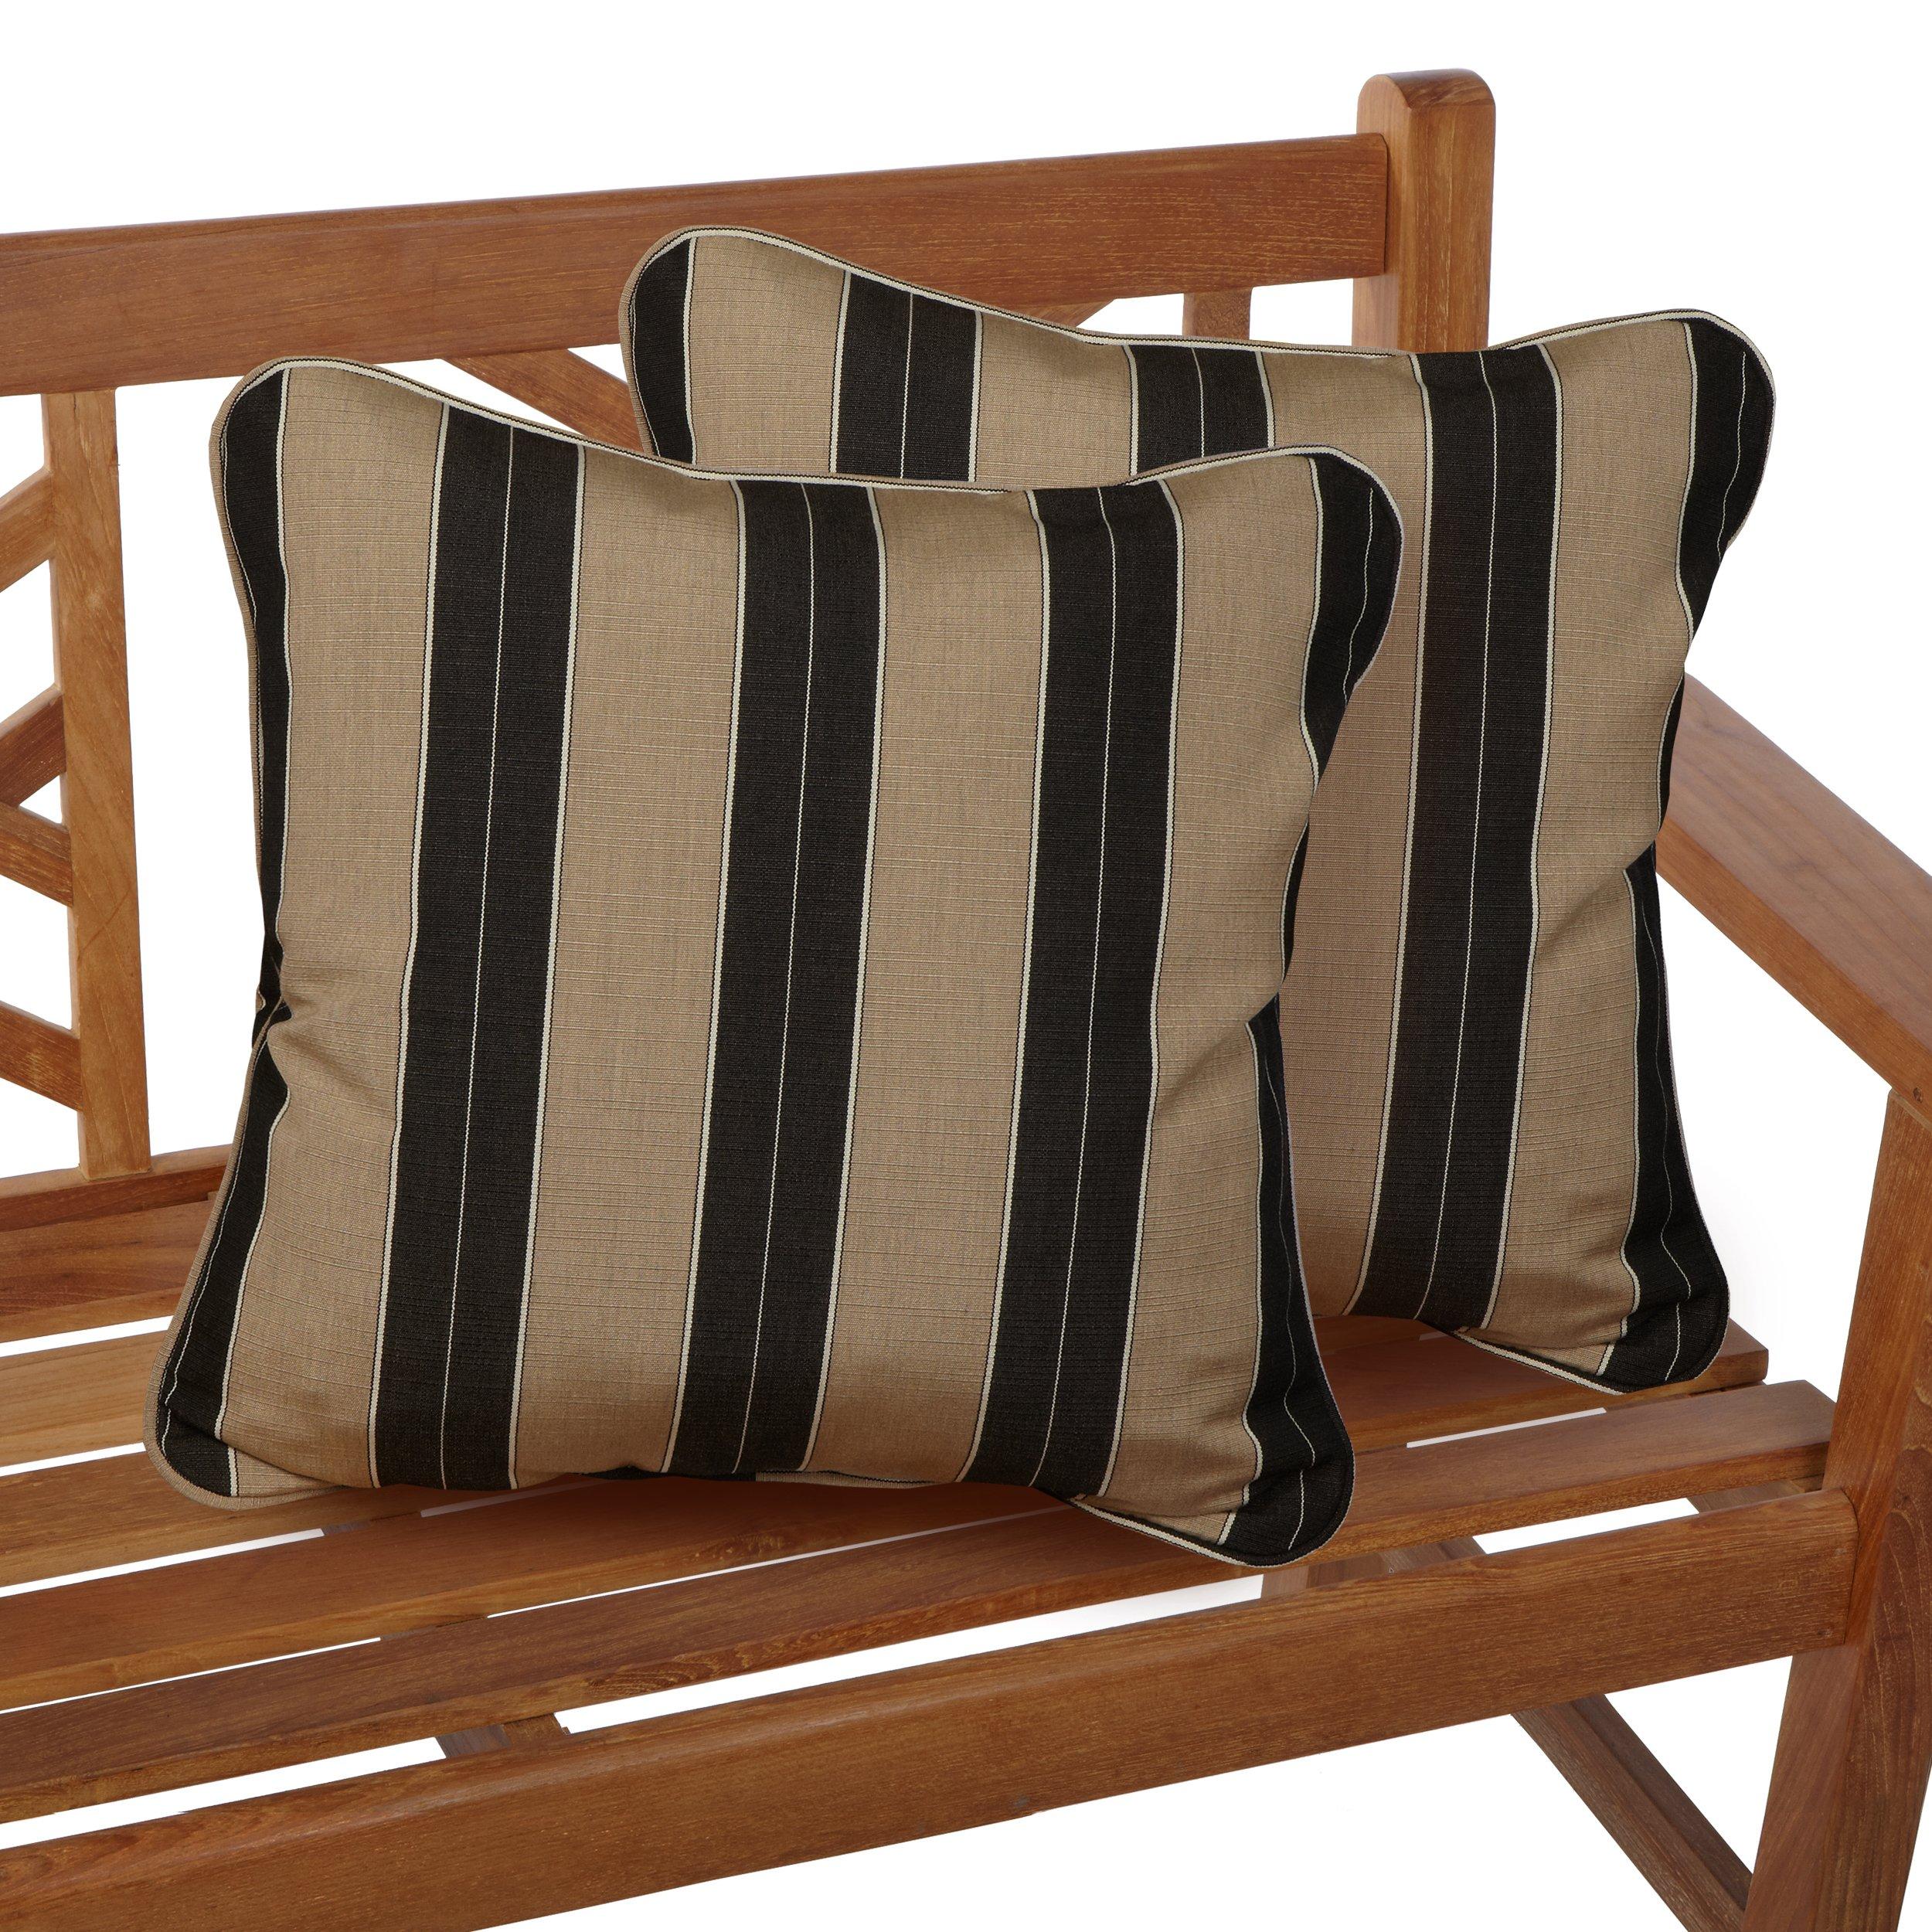 Mozaic Company Sunbrella Indoor/ Outdoor 18-inch Corded Pillow, Berenson Tuxedo, Set of 2